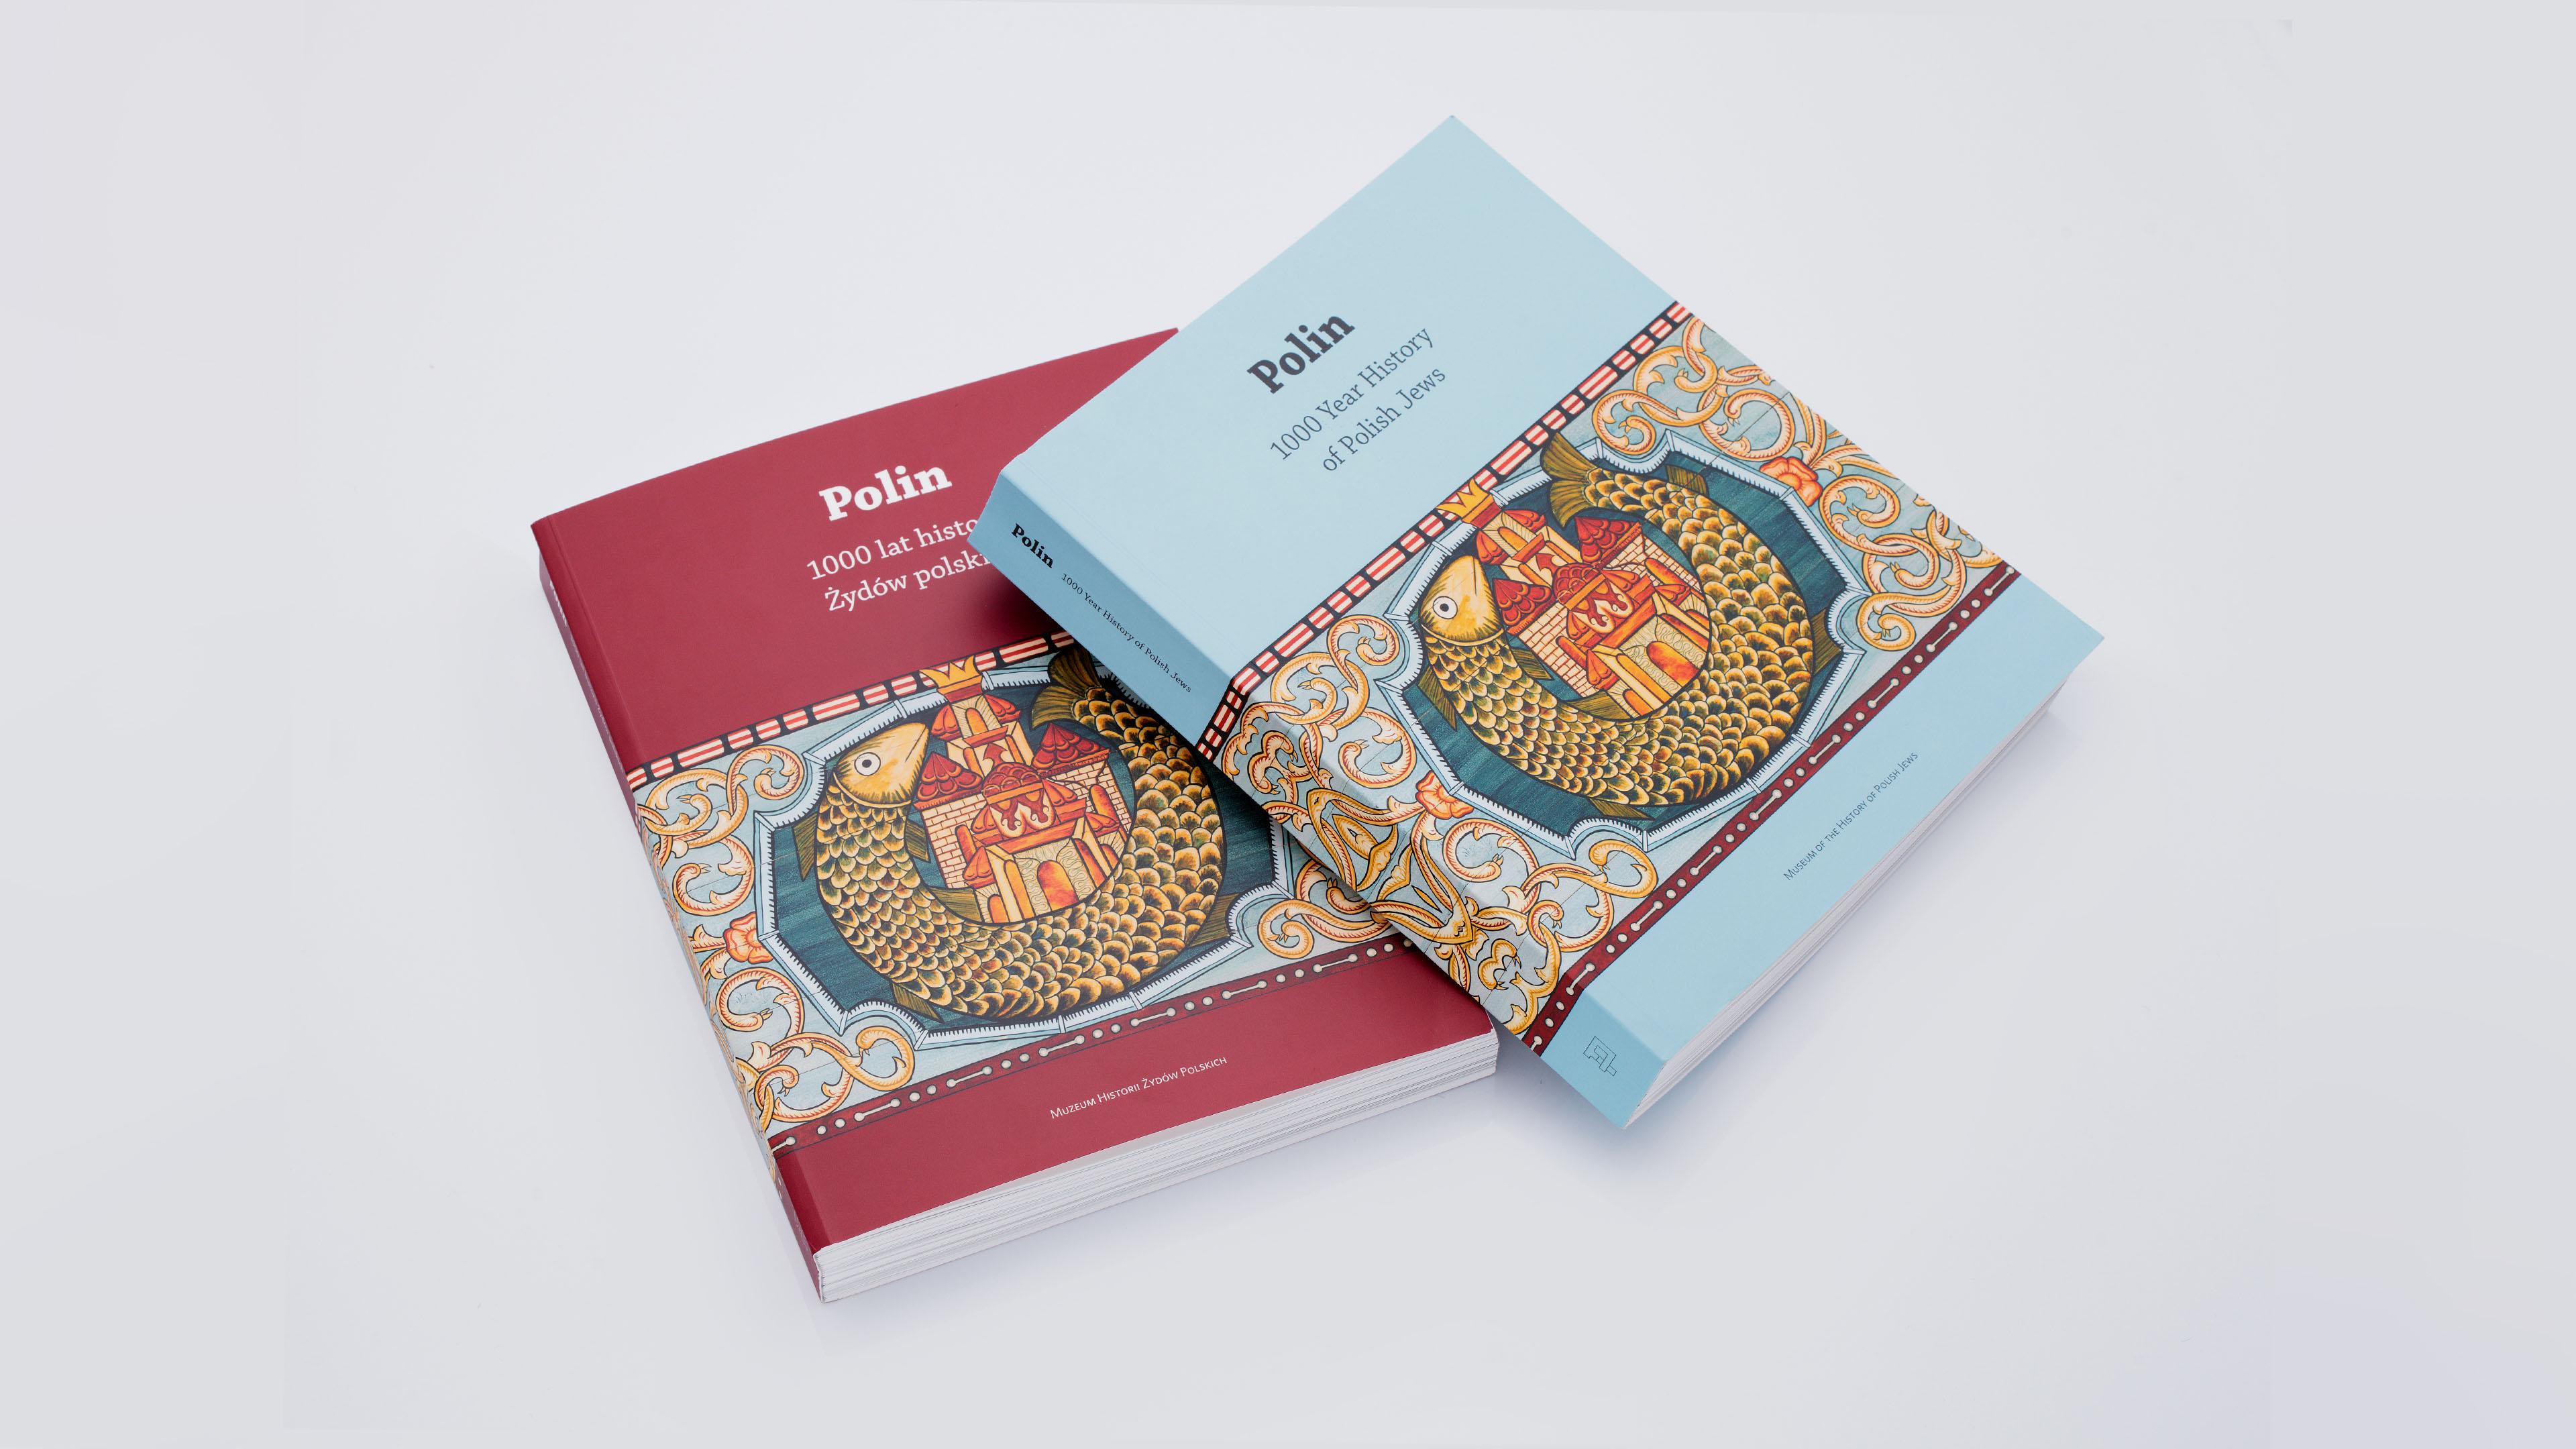 Polin - The Codeine Design